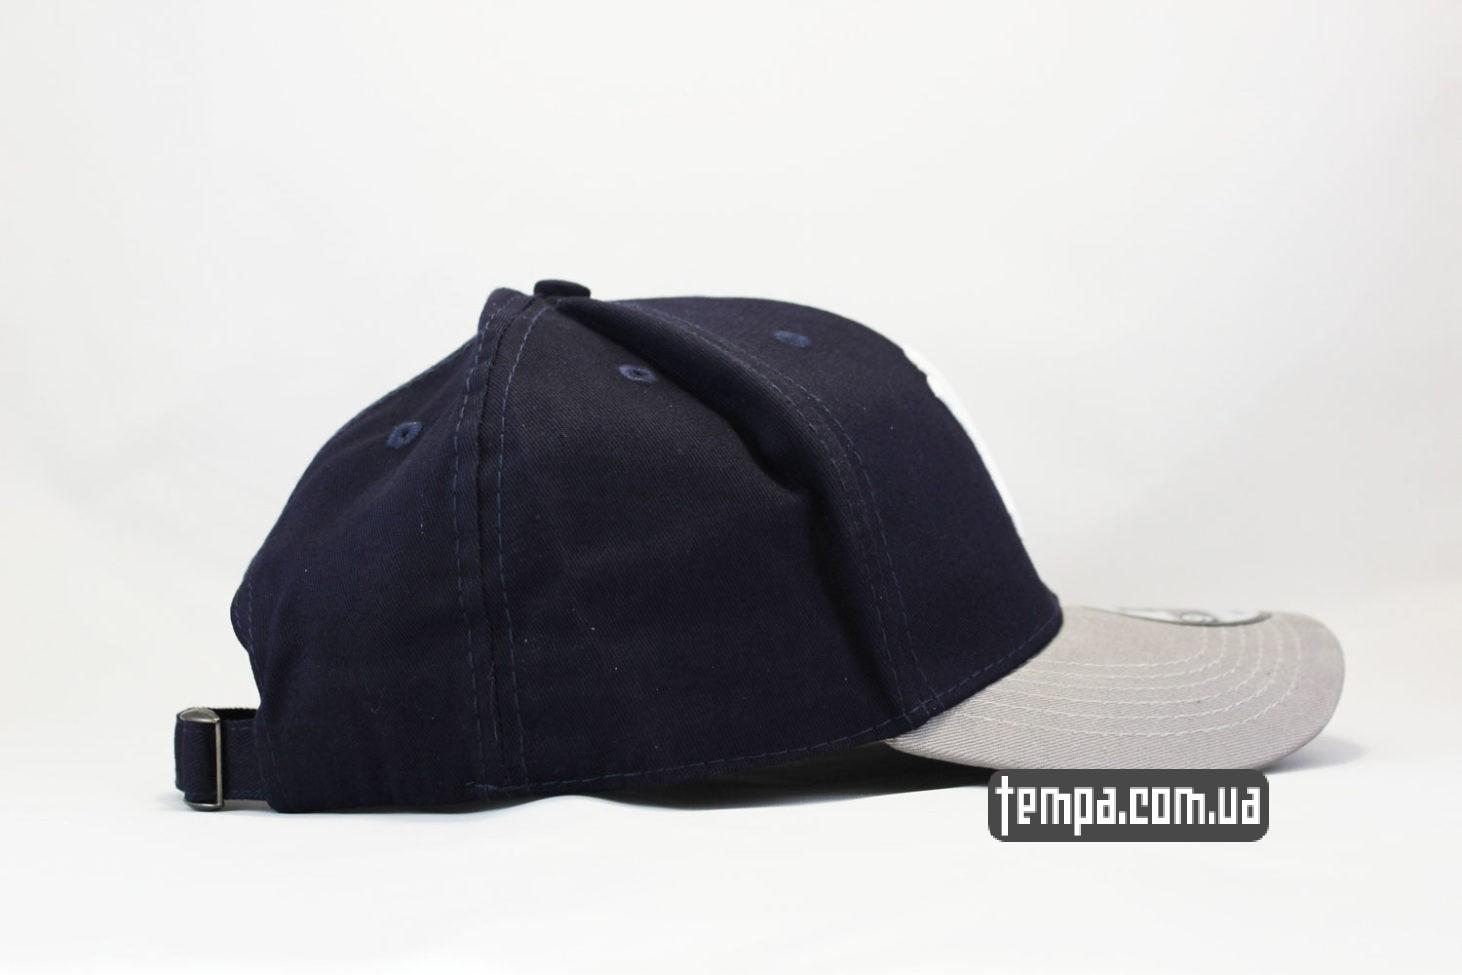 снепбек кепка бейсболка YANKESS New York snapback синяя америкаснкая